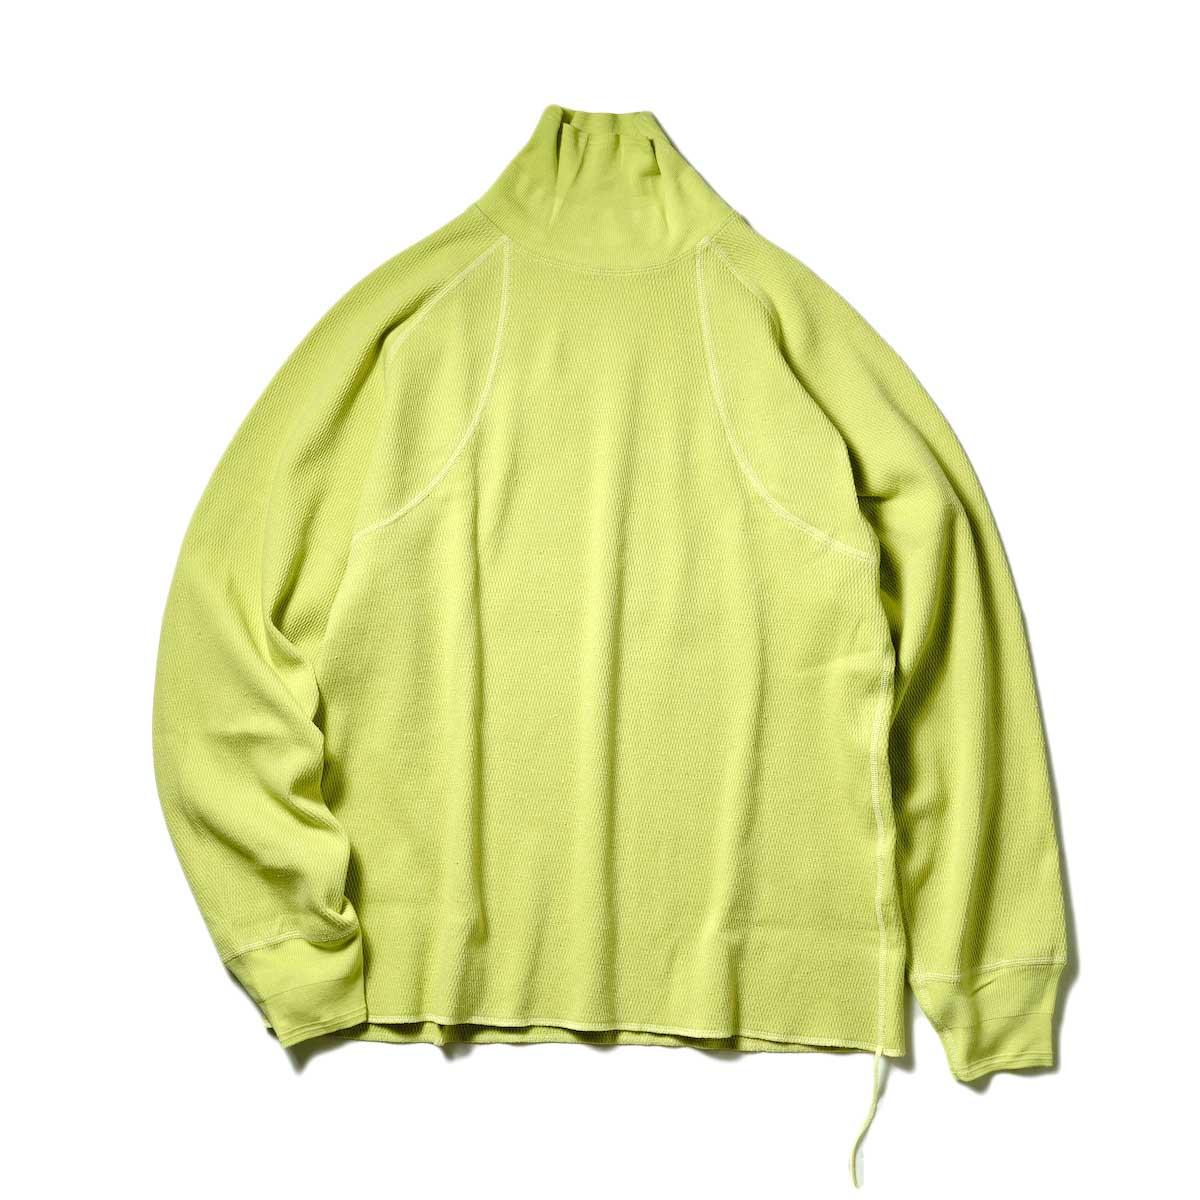 JANE SMITH / HONYCONB DOUBLE RAGLAN HIGH NECK (Neon)